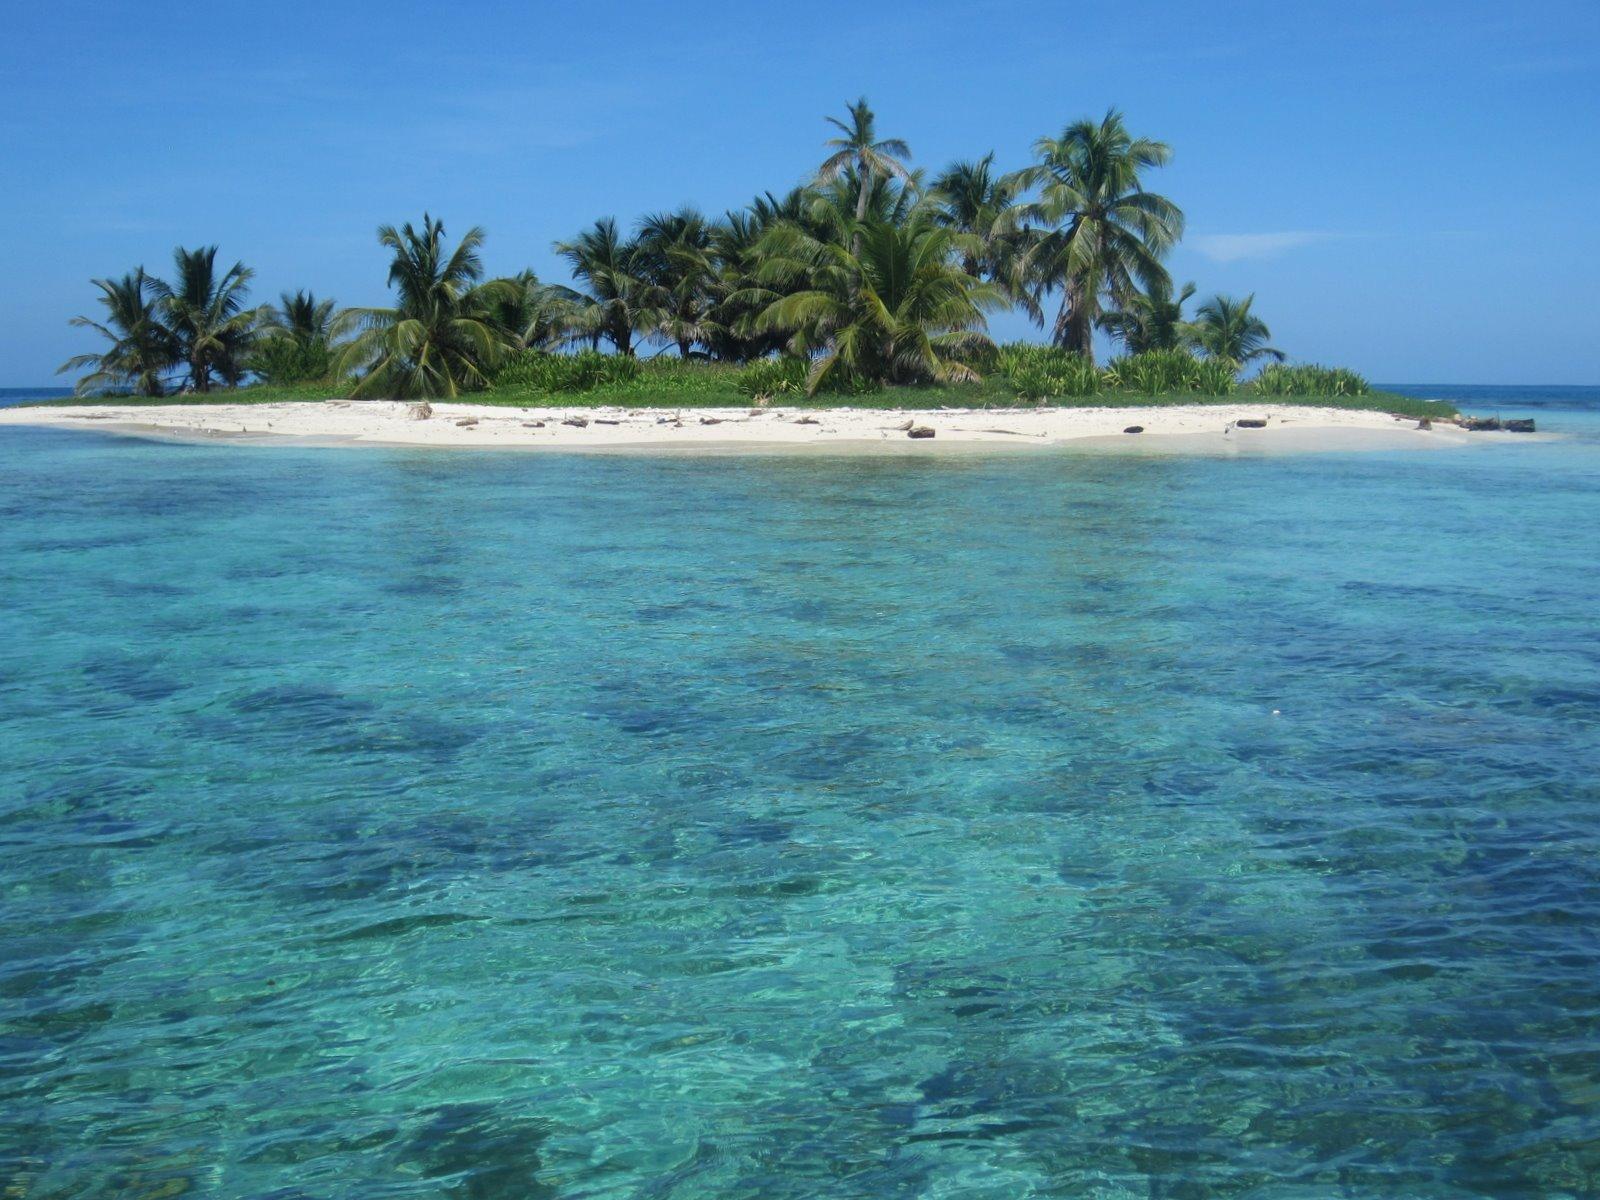 stranded on a desert island essay